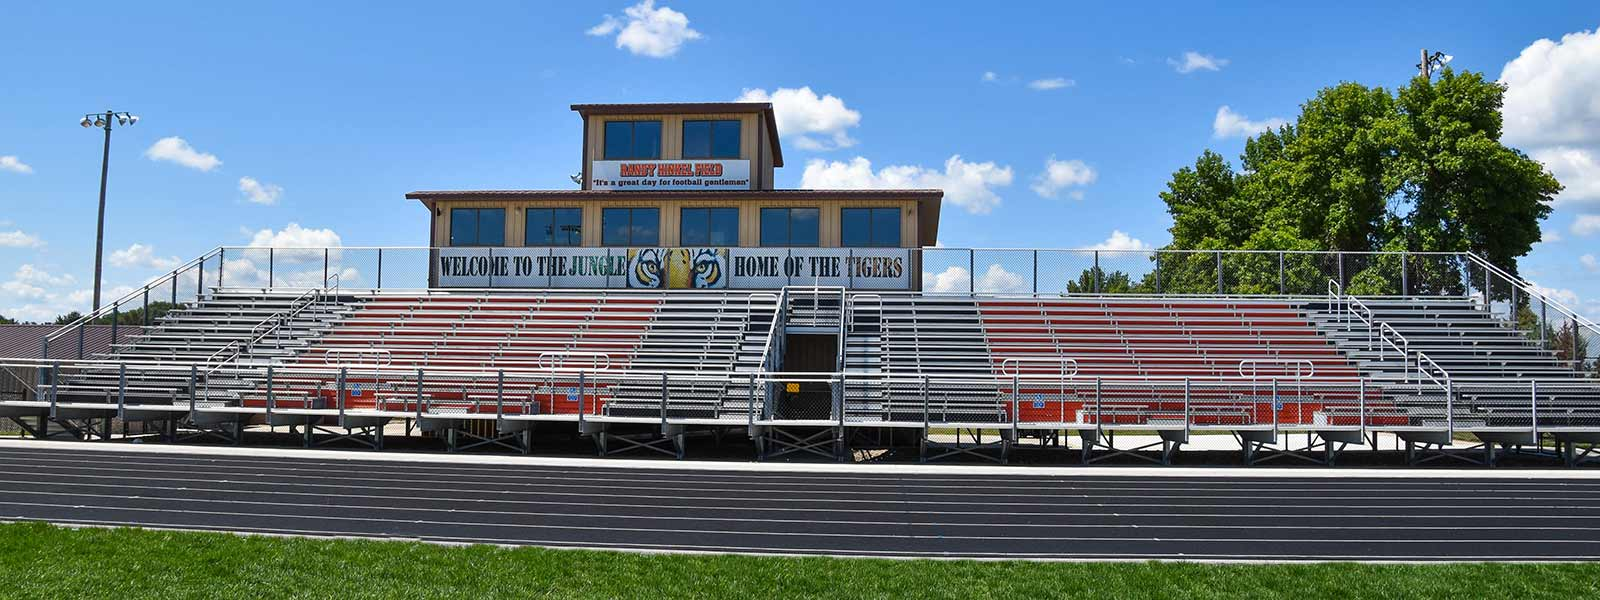 Stadium and Track